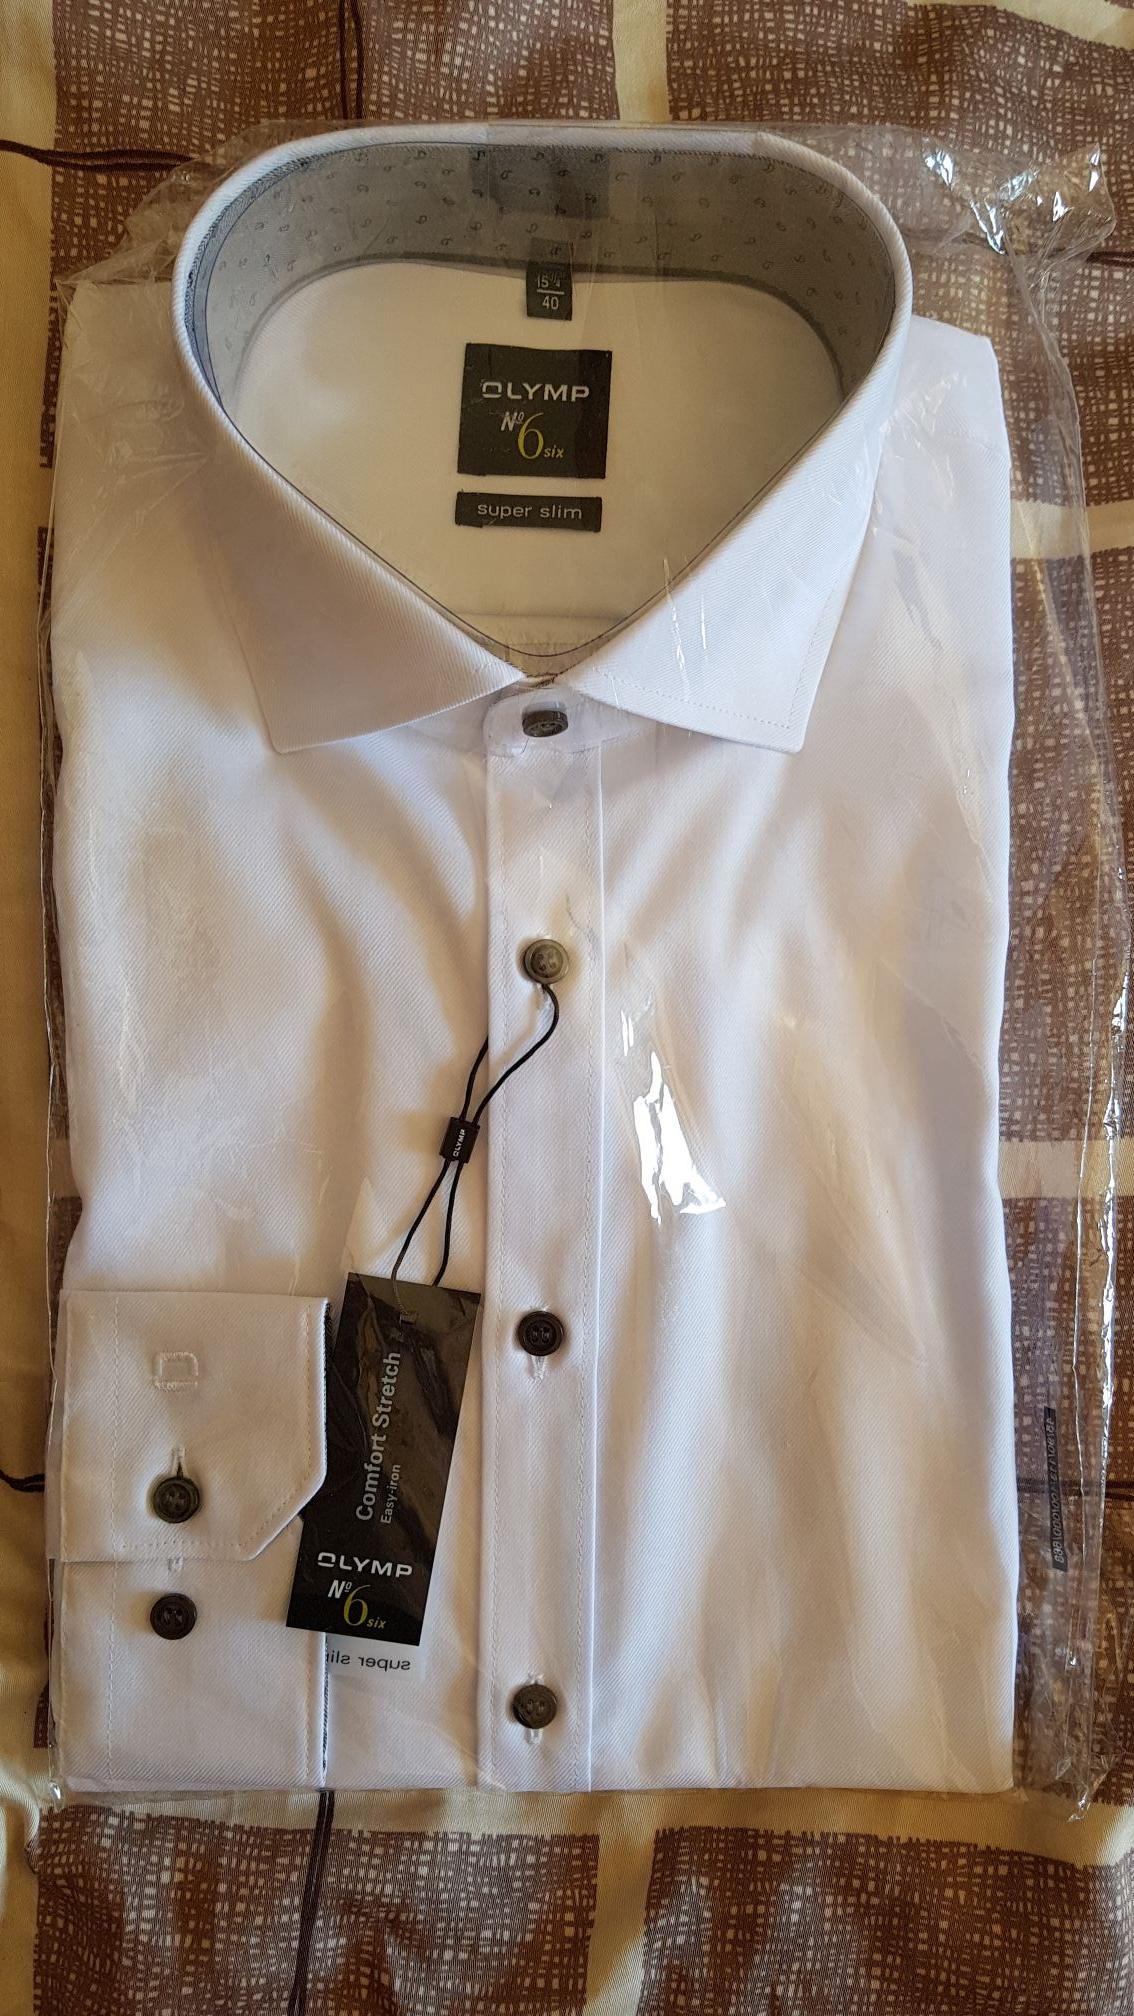 Galeria Karstadt / Kaufhof: Hemden stark reduziert, z.B. OLYMP No. 6 ab 19,99€ (Lokal Köln)